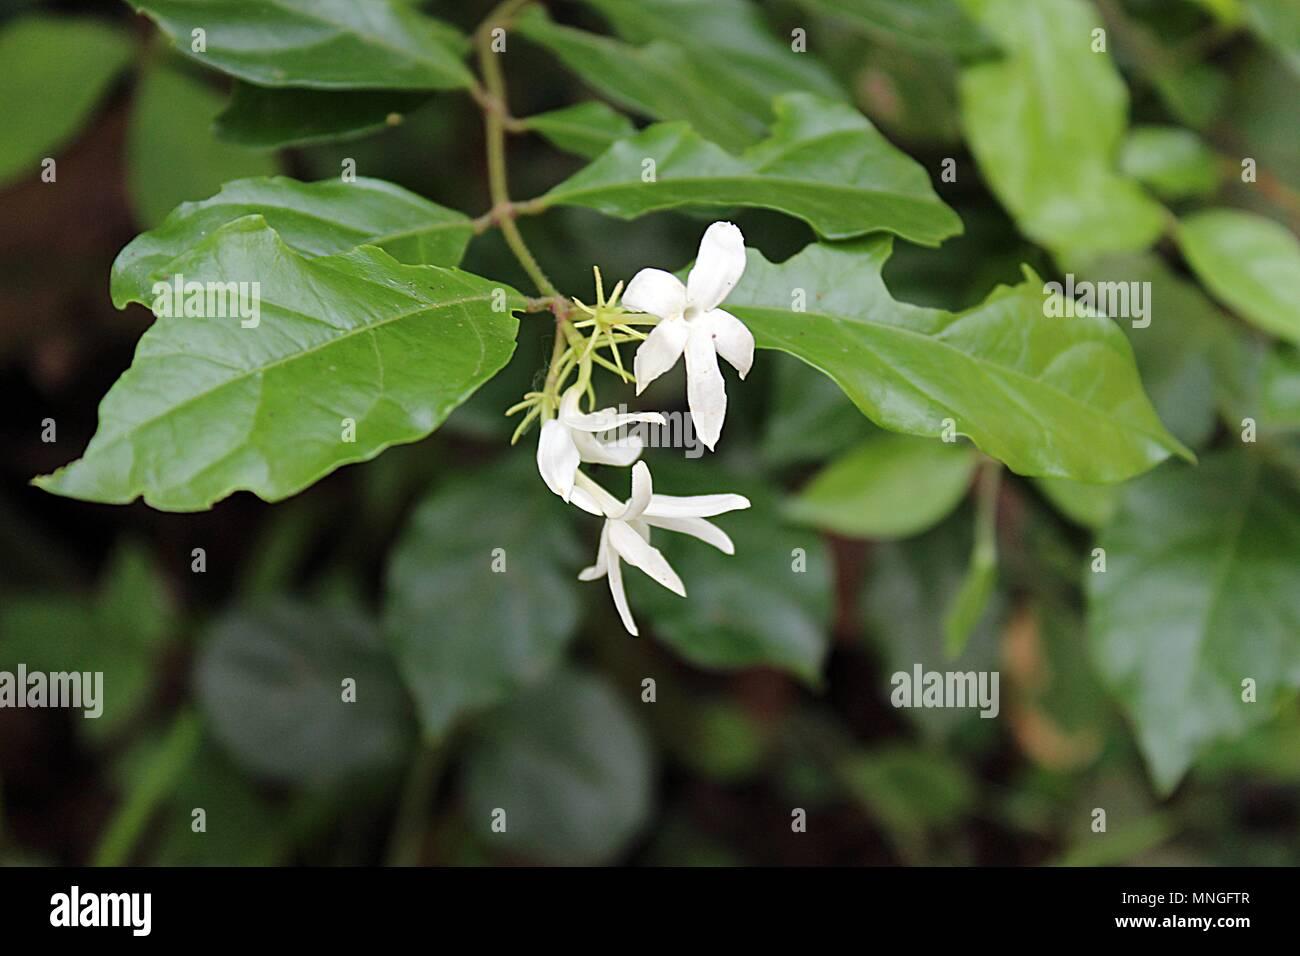 Delicate White Flowers Stock Photo 185375143 Alamy